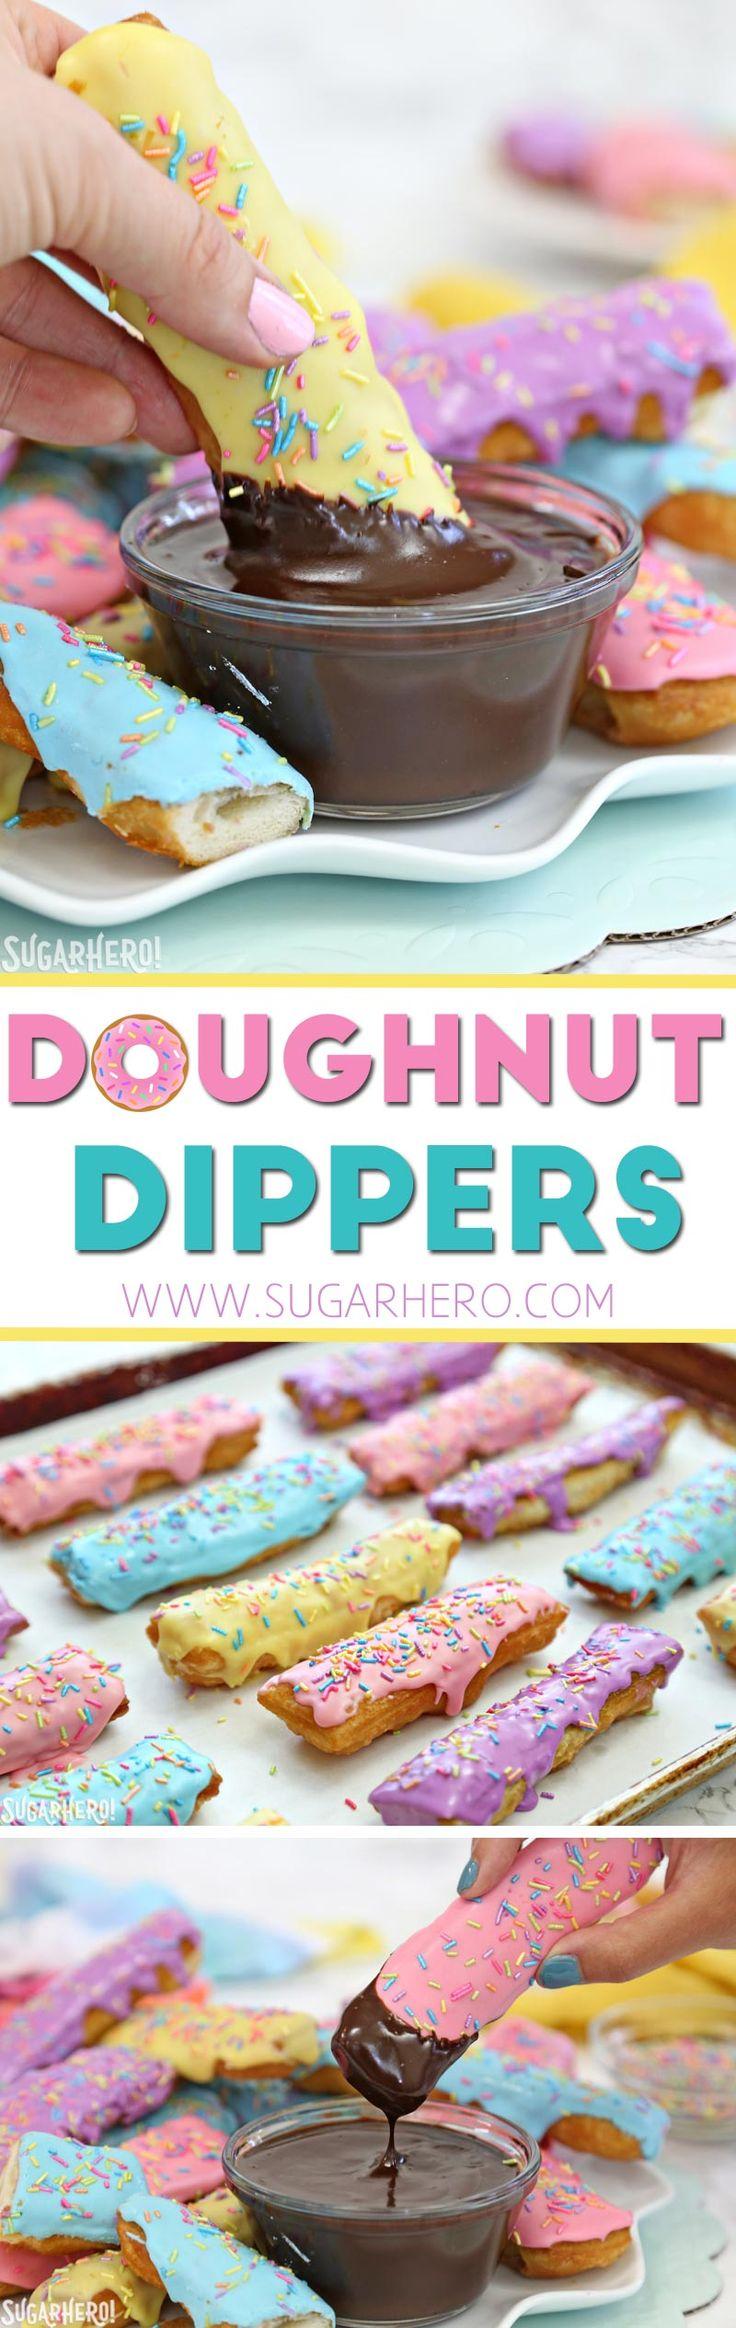 Doughnut Dippers - super easy homemade doughnuts with warm mocha sauce!   From SugarHero.com